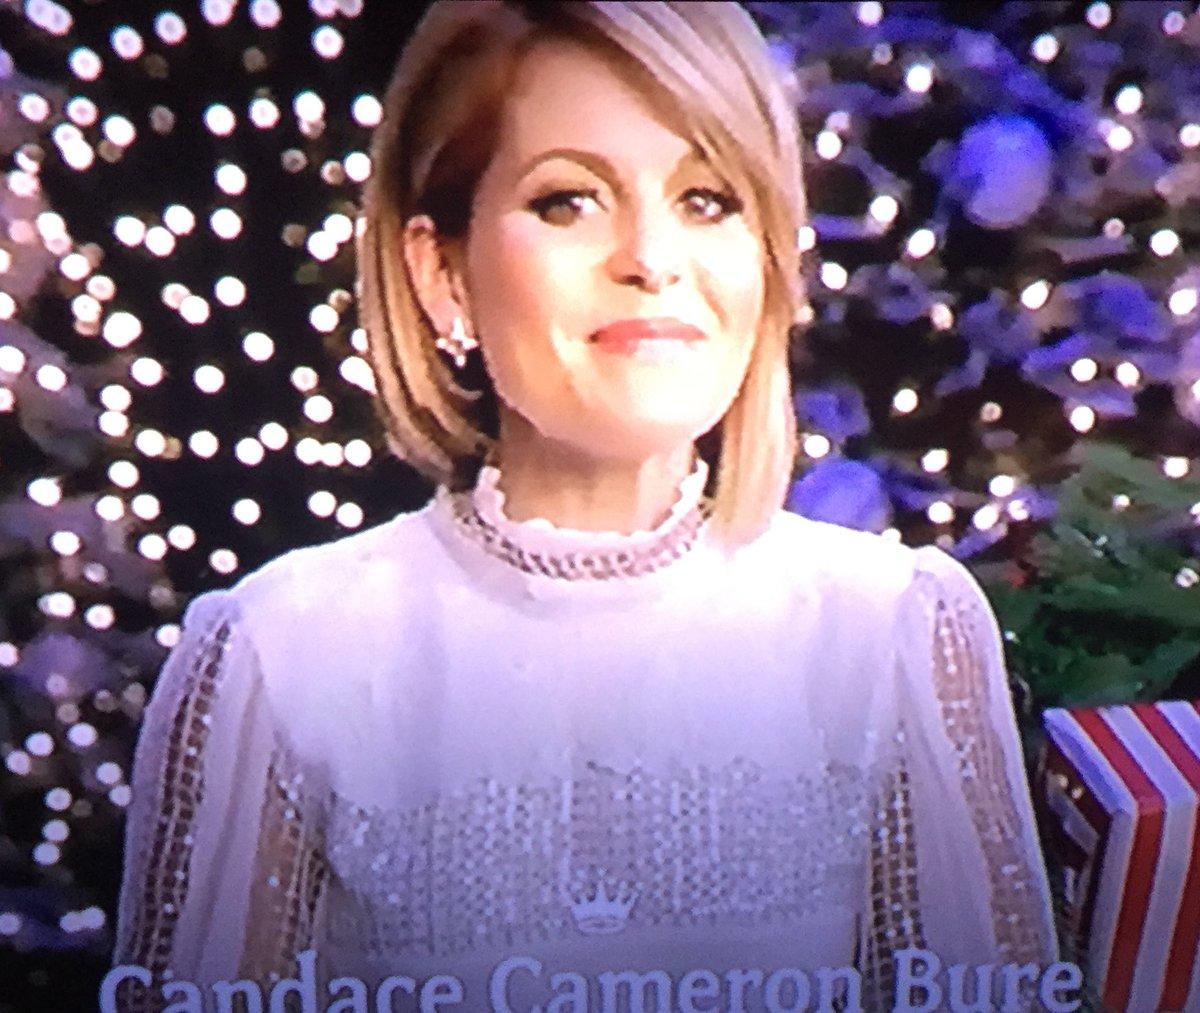 Candace Cameron Bure on Twitter: \